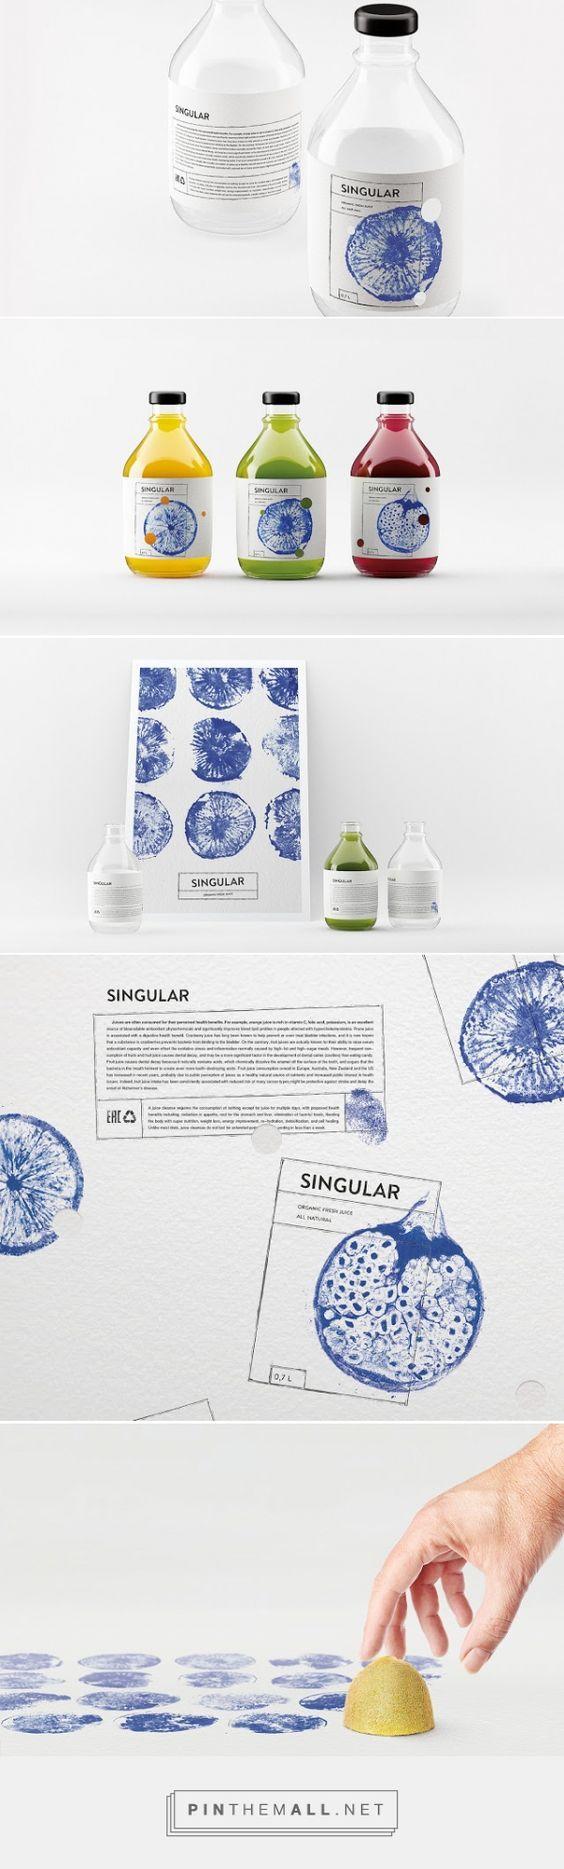 SINGULAR Fresh Juice packaging concept designed by Nikita Ivanov - http://www.packagingoftheworld.com/2015/11/singular-fresh-juice-concept.html: